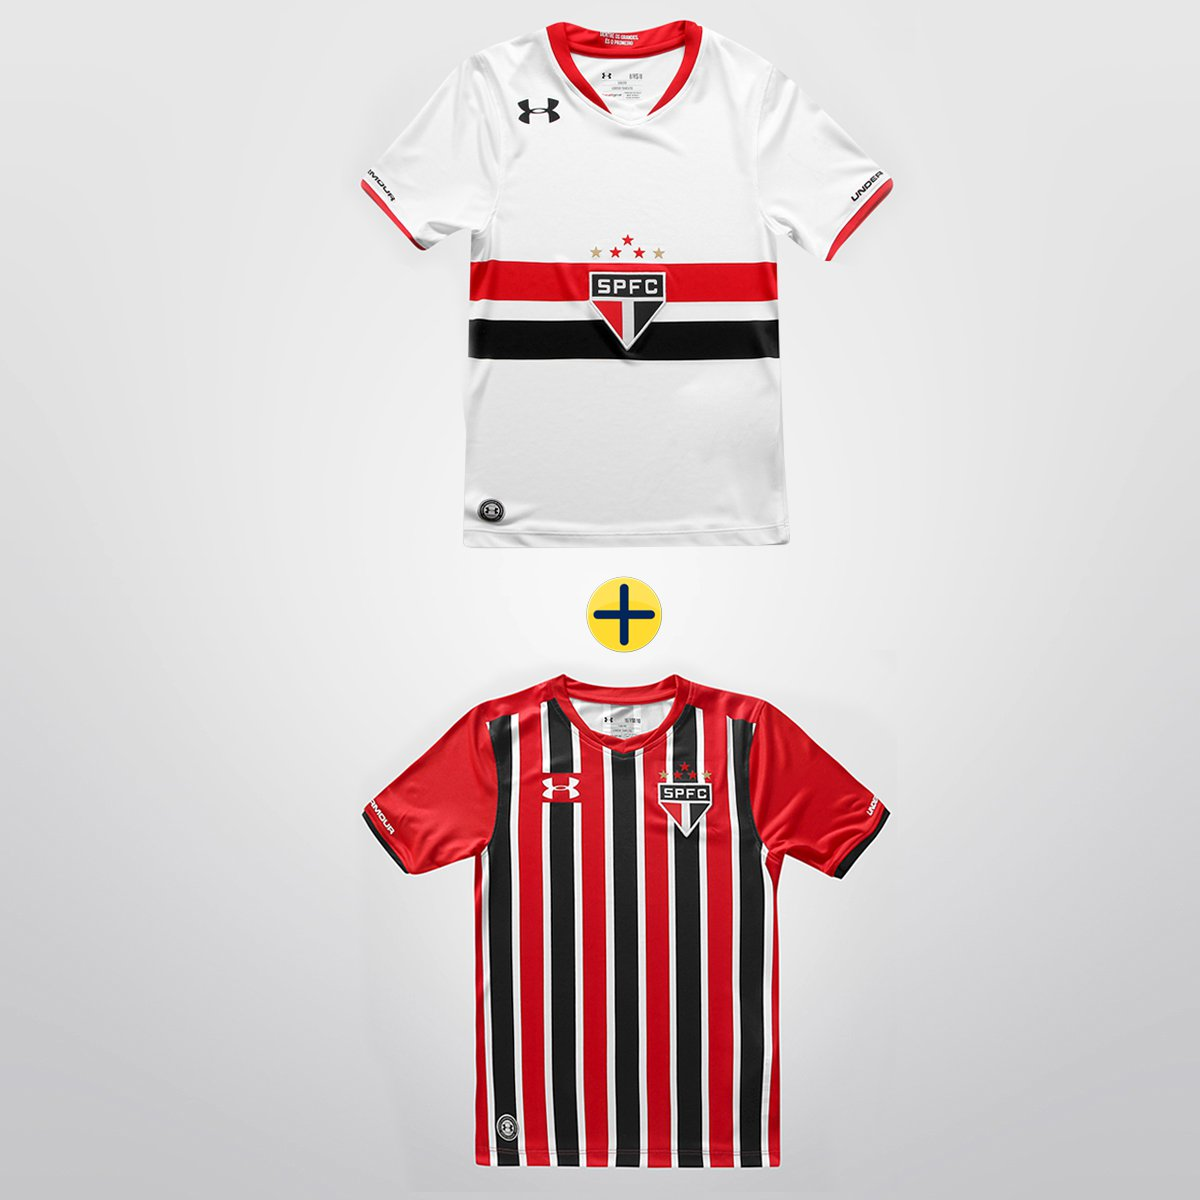 9558224878 Kit Infantil Under Armour - Camisa São Paulo I 2015 s nº + Camisa São Paulo  II 2015 s nº - Compre Agora